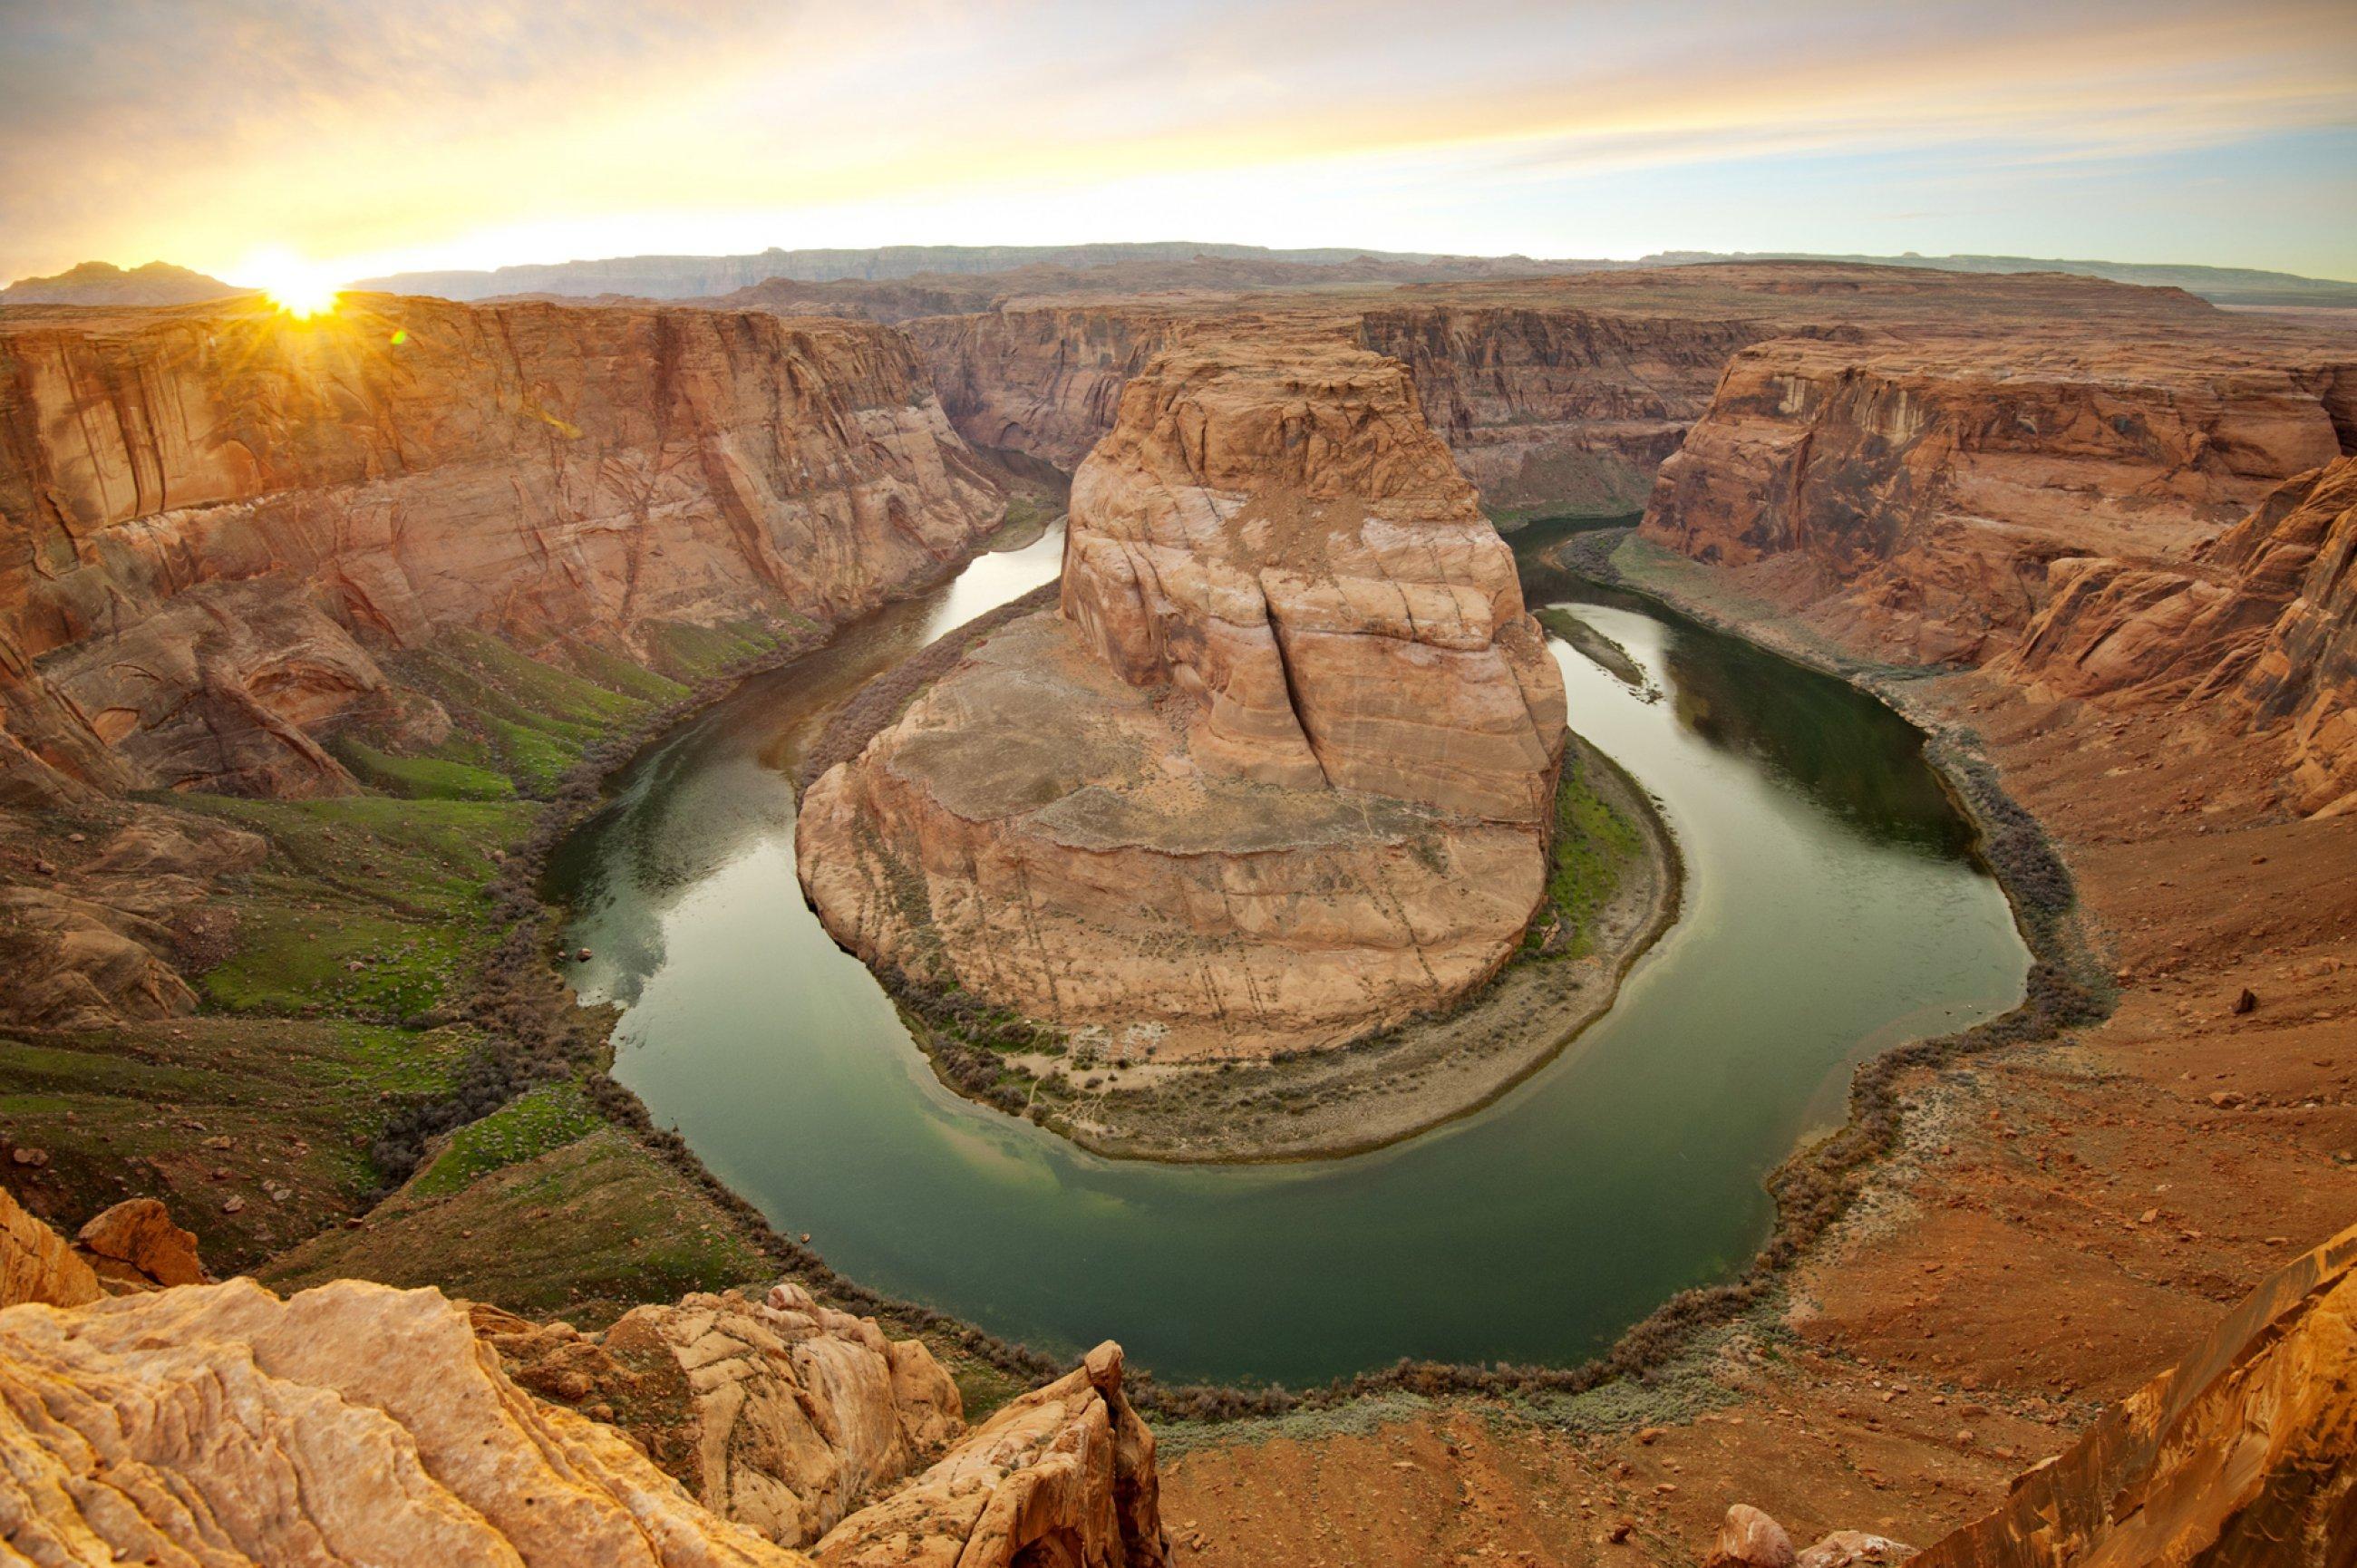 https://bubo.sk/uploads/galleries/16241/grand-canyon-shutterstock-236202247-4-.jpg